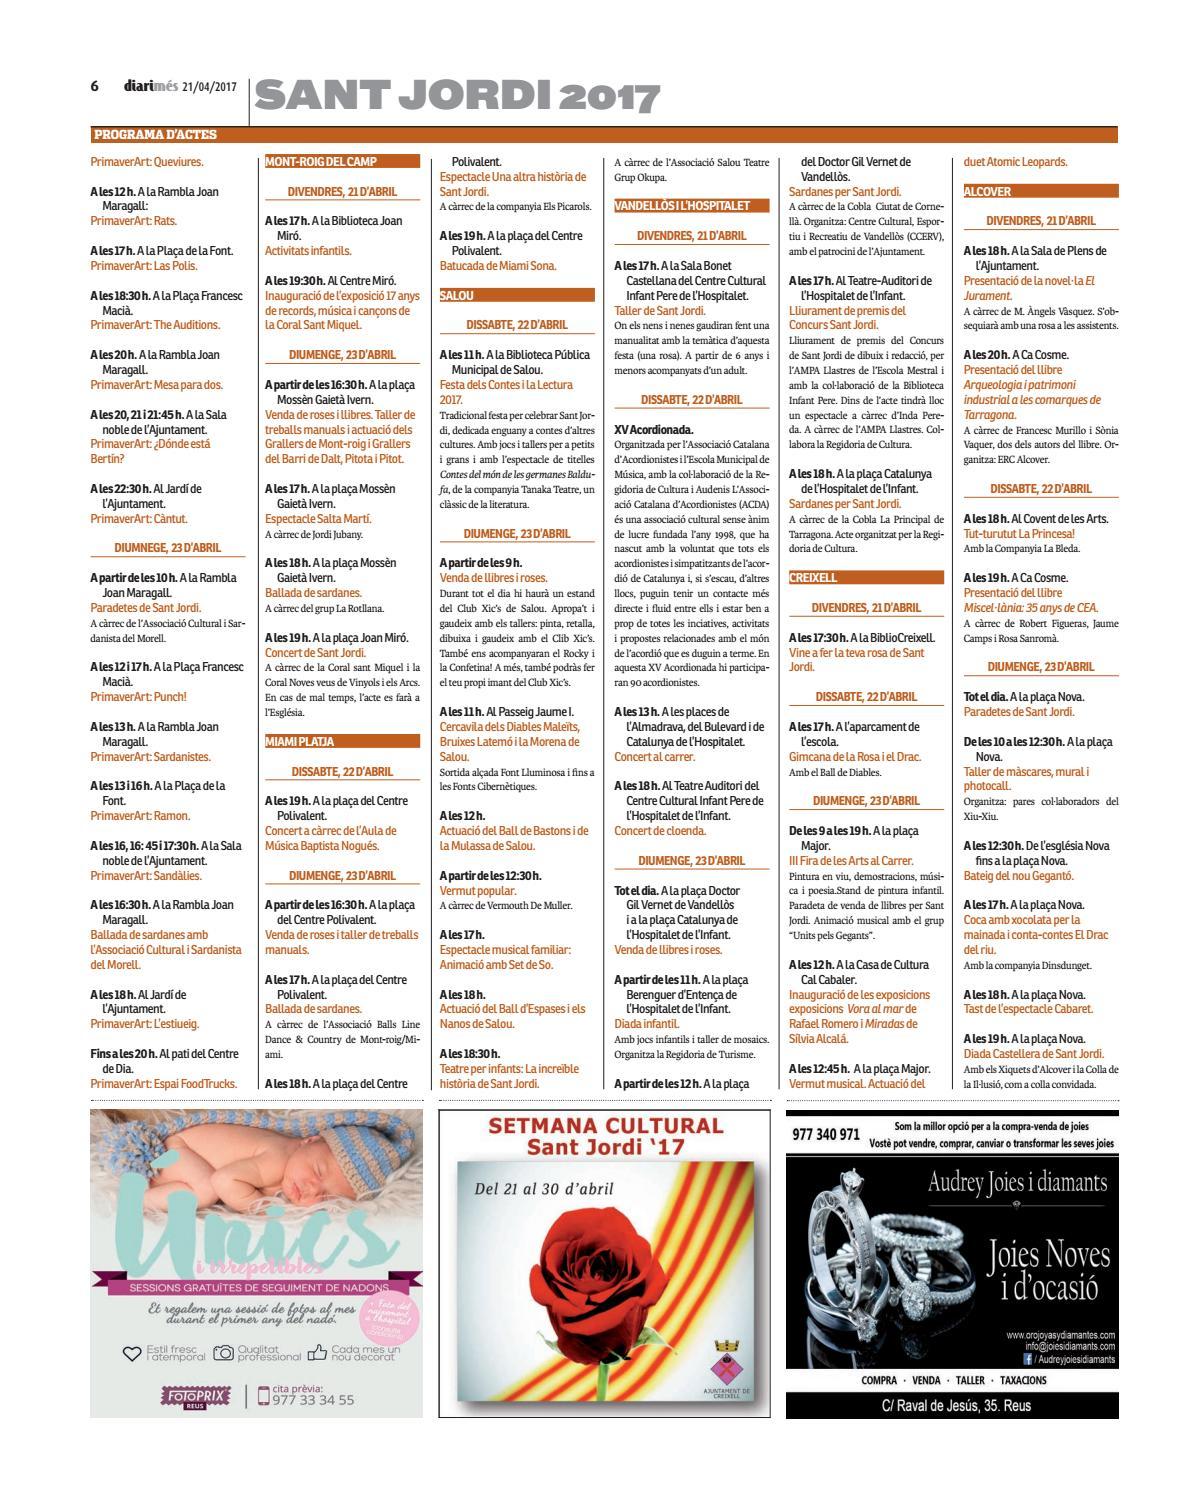 21 2017 Issuu Diari Més D'abril De By CeBodx